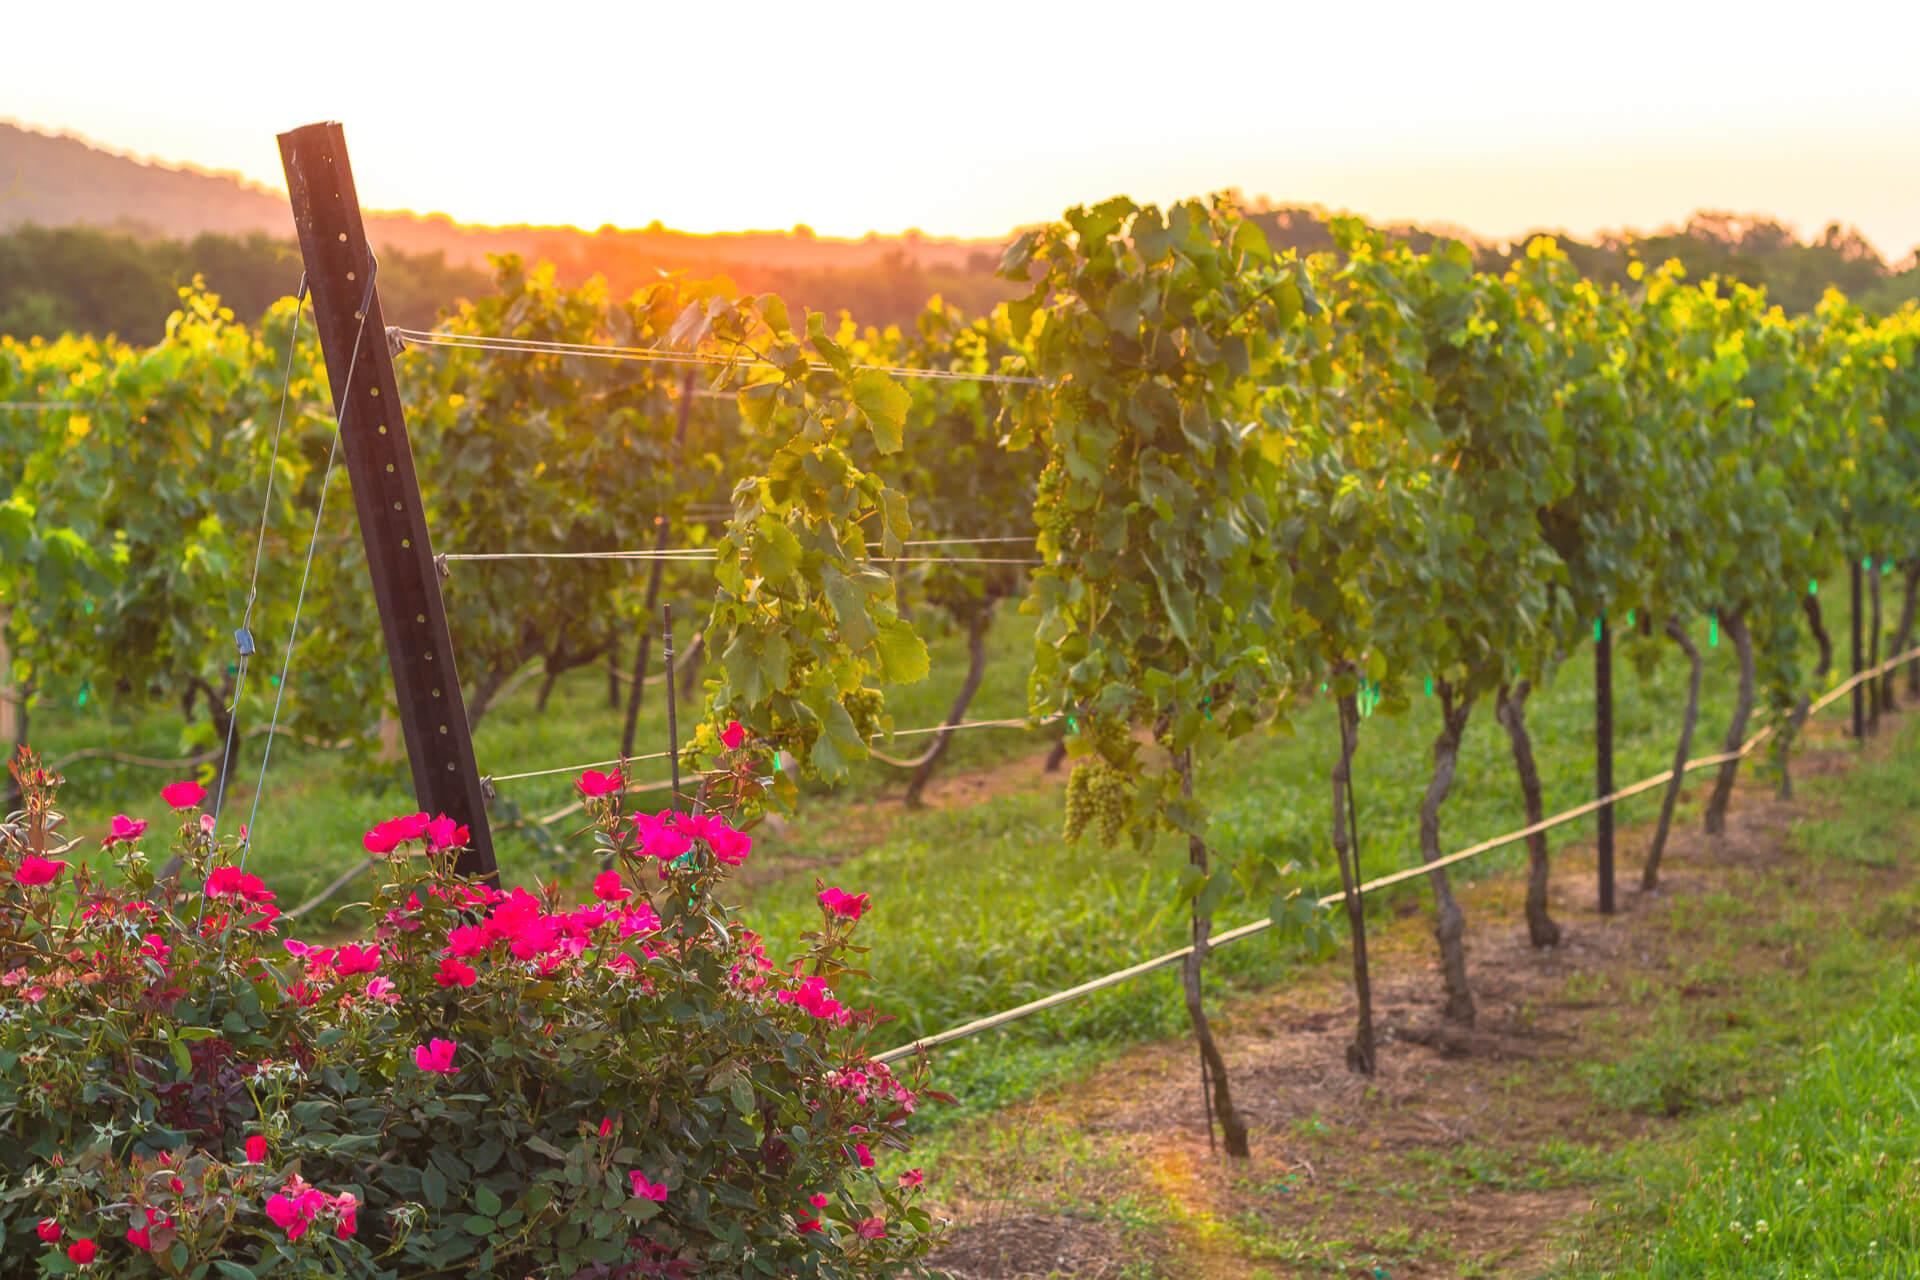 Chaumette Vineyards & Winery in Missouri